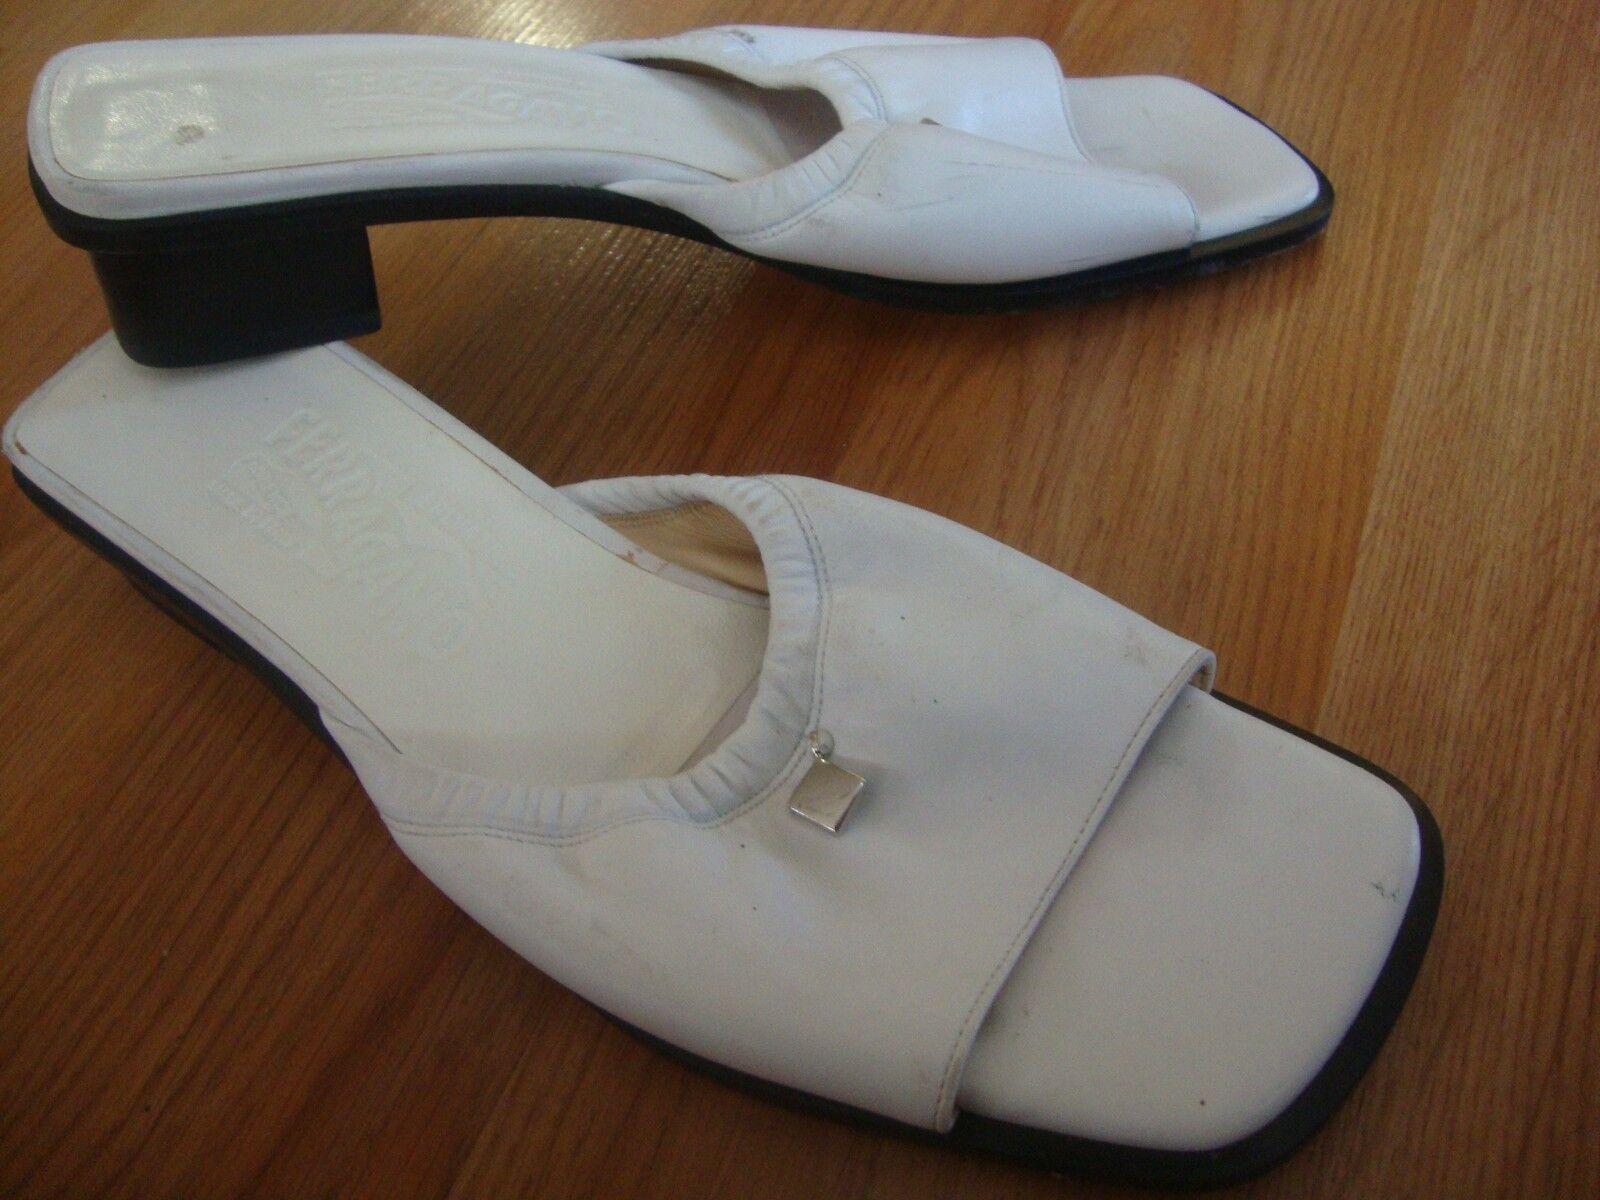 brise homme Swims Tennis (462108) 11 Taille Chaussures l'eau